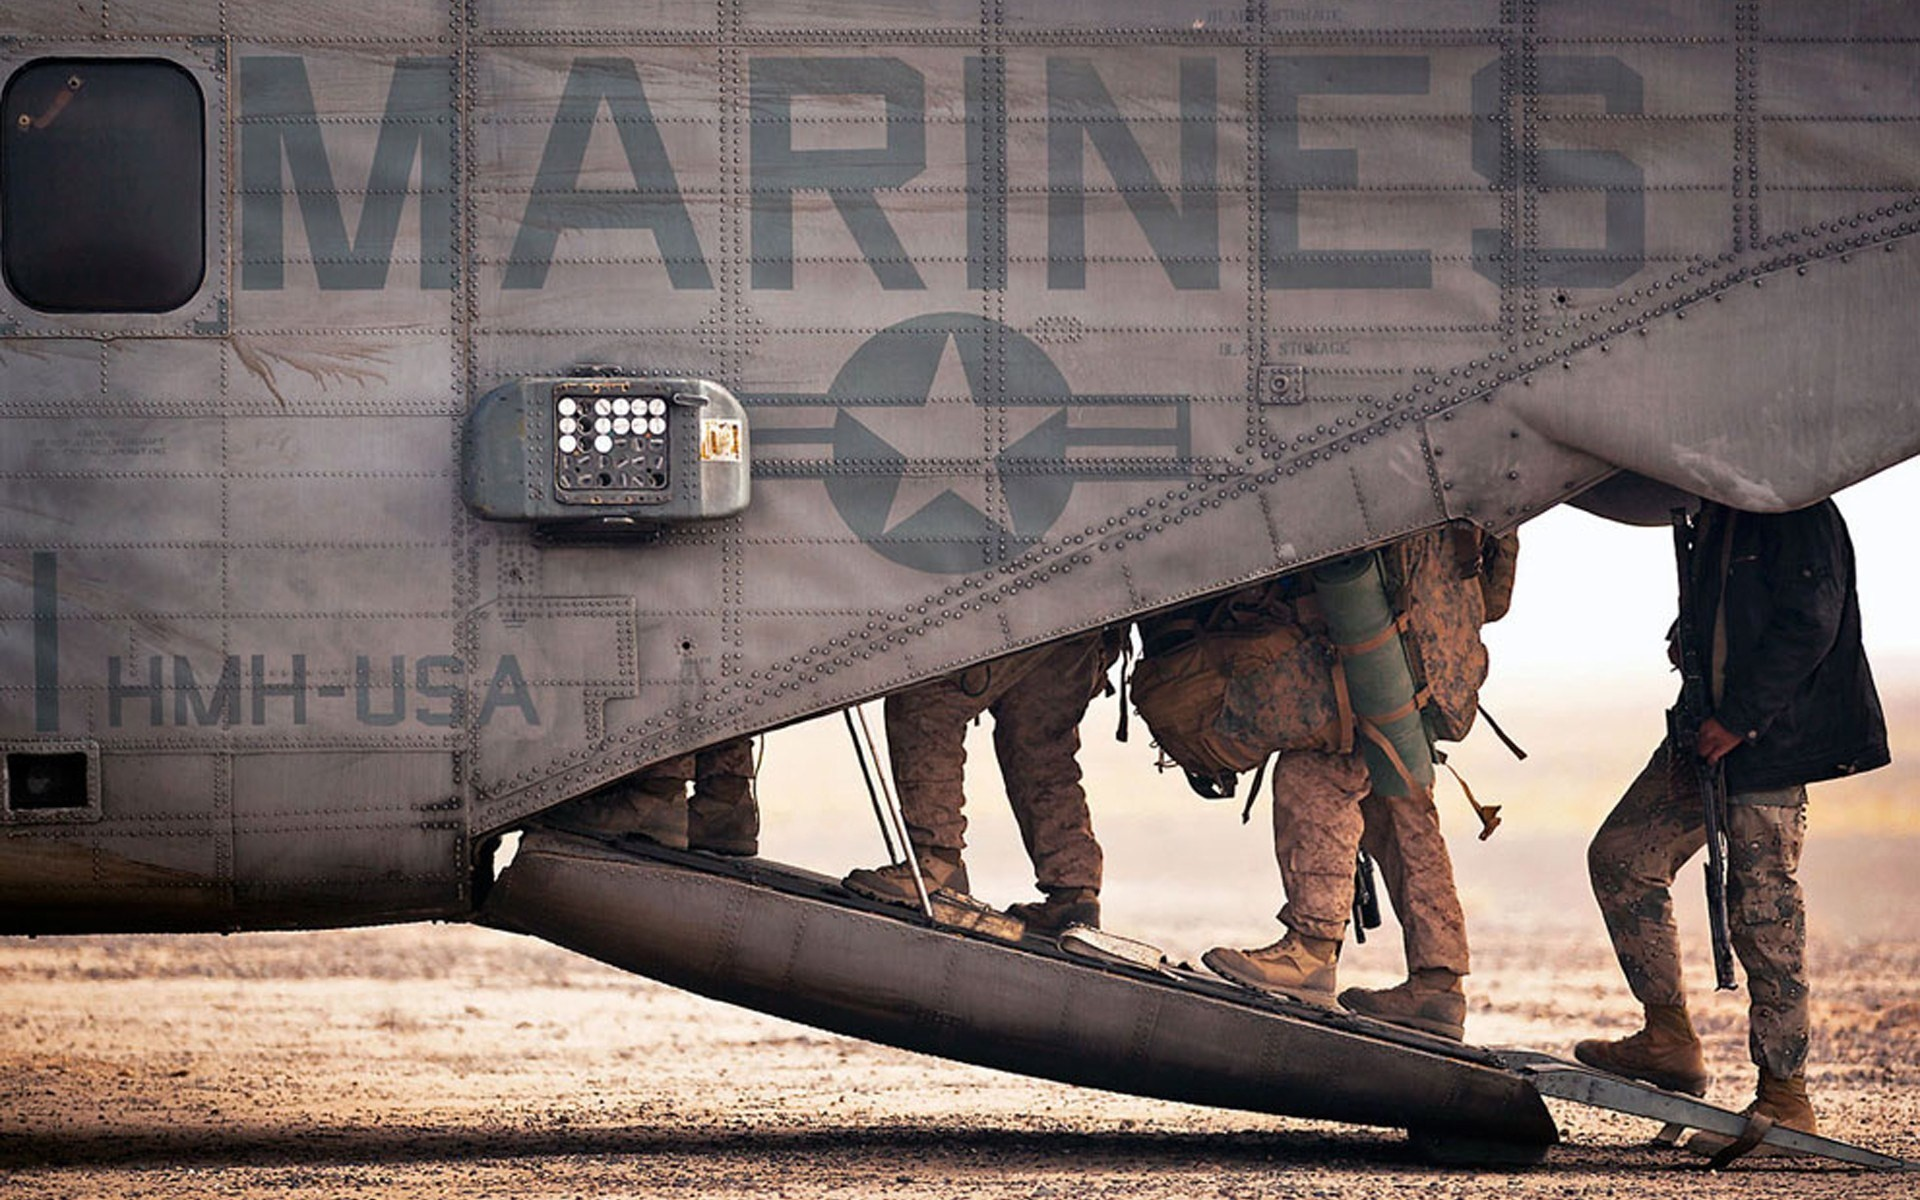 U.S. Marines Photo #6969782